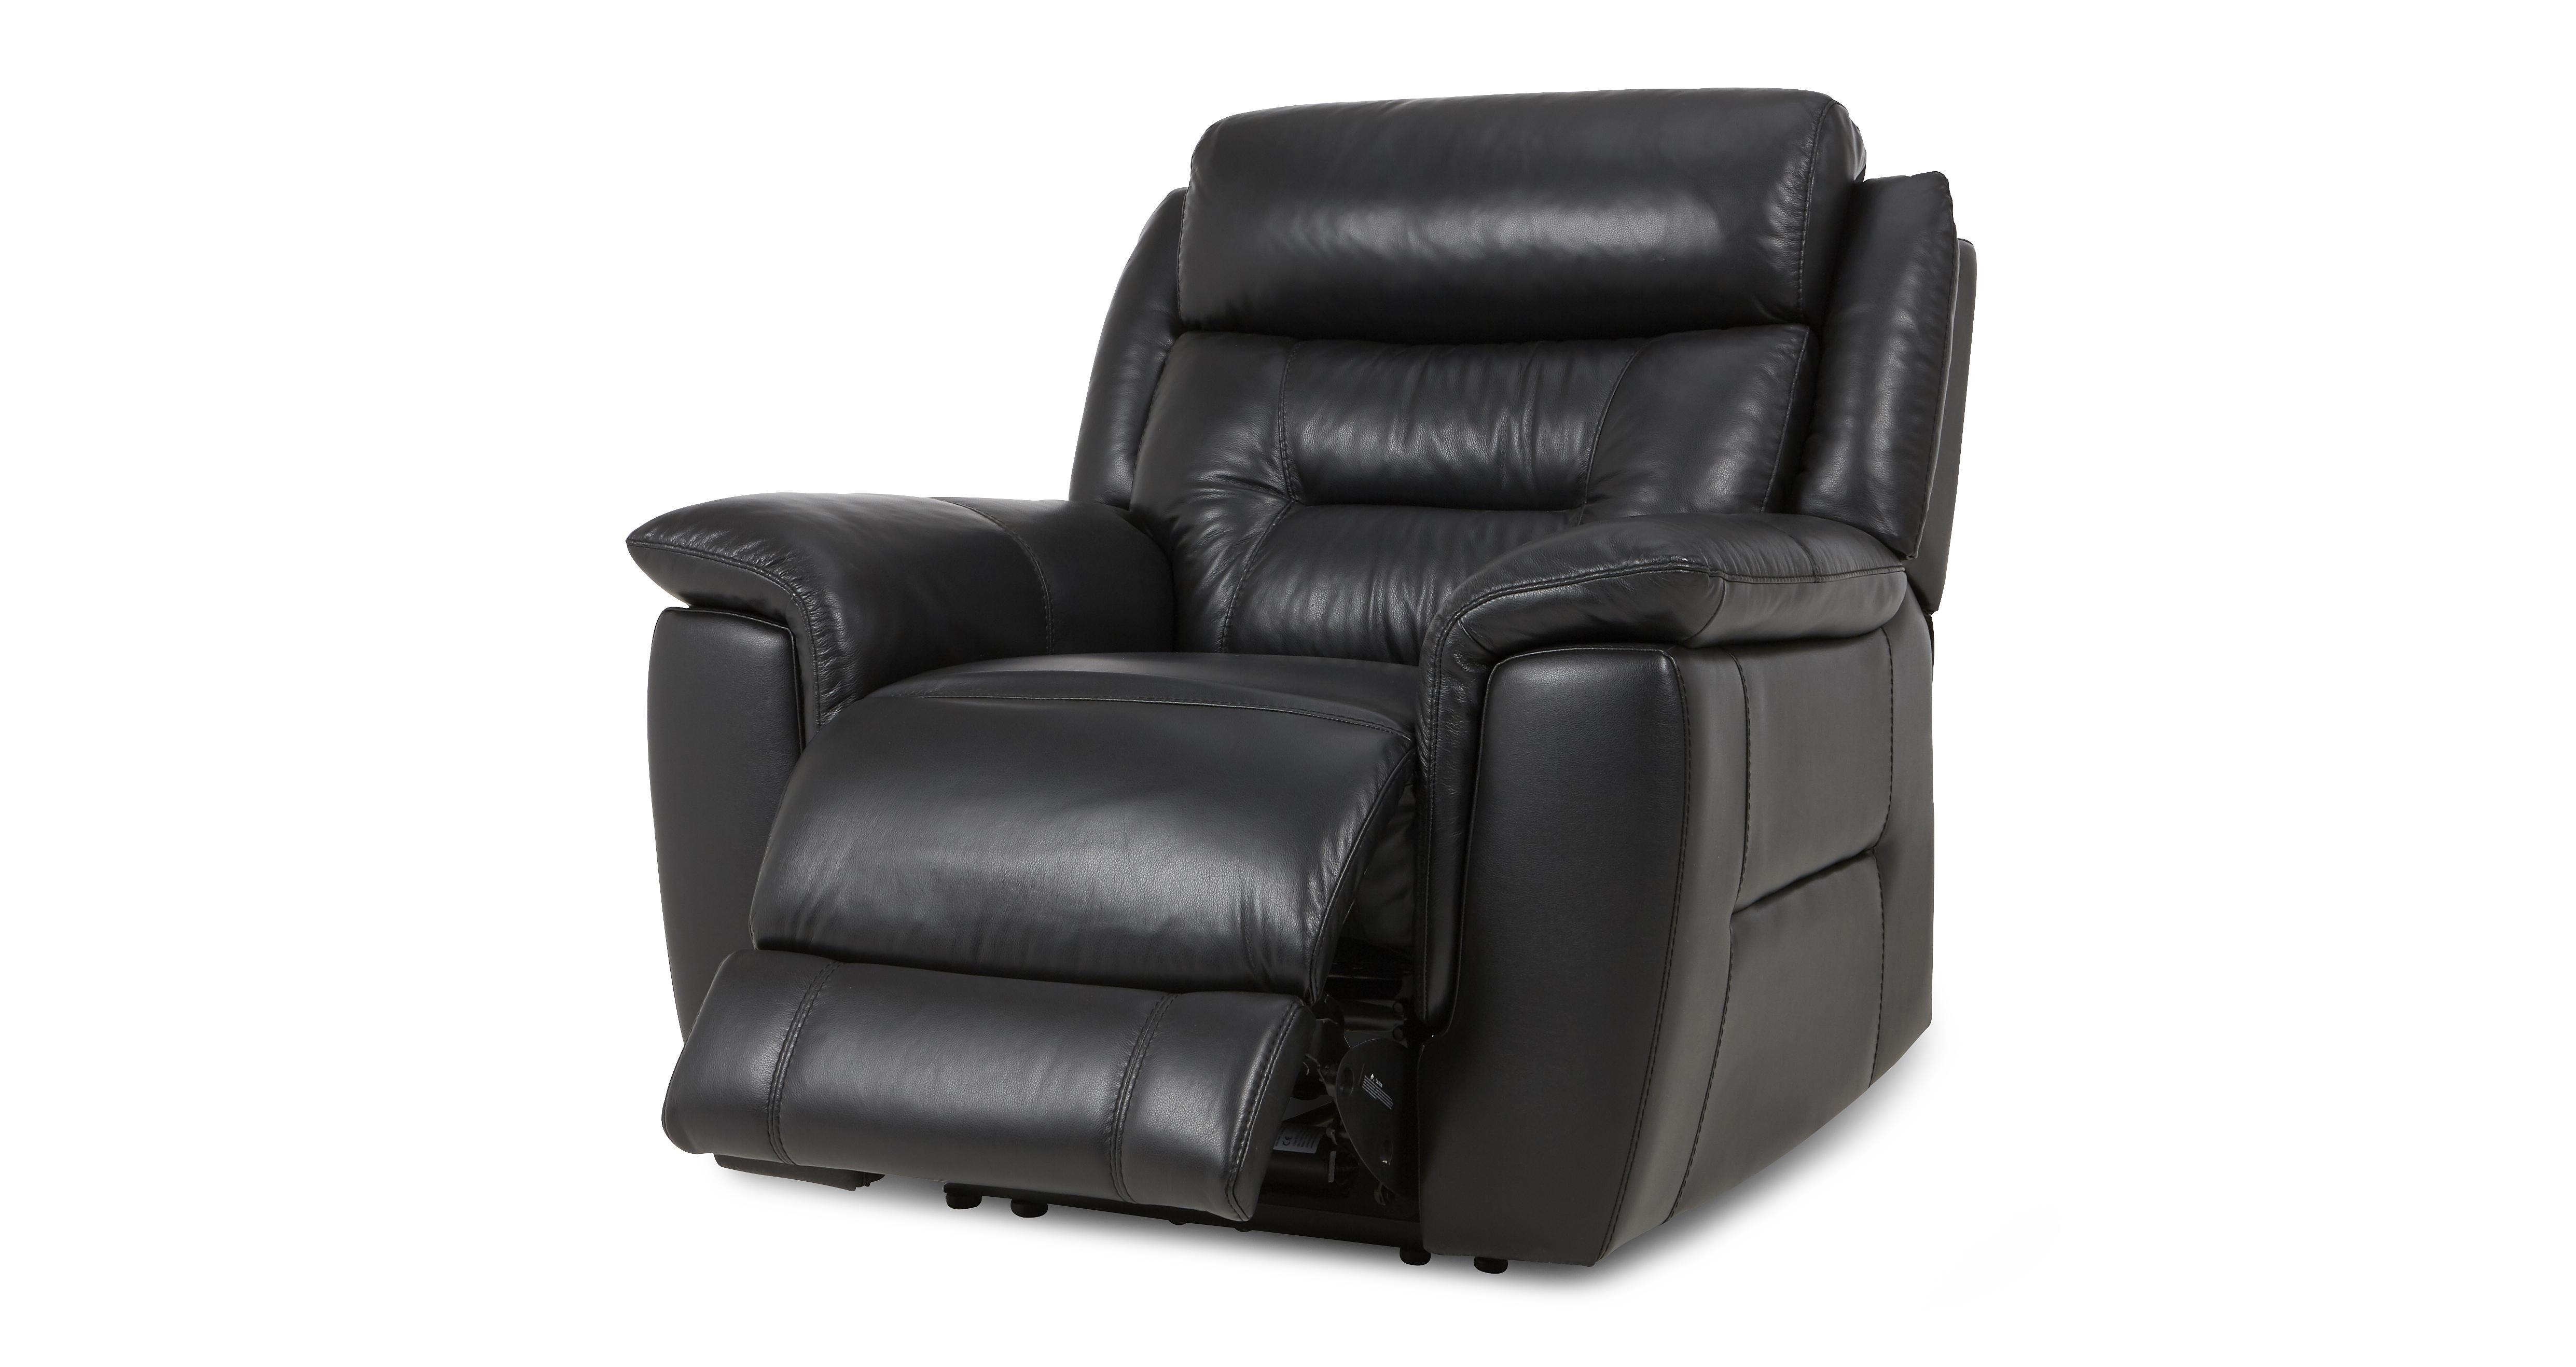 Jenson Electric Recliner Chair Premium Dfs Ireland